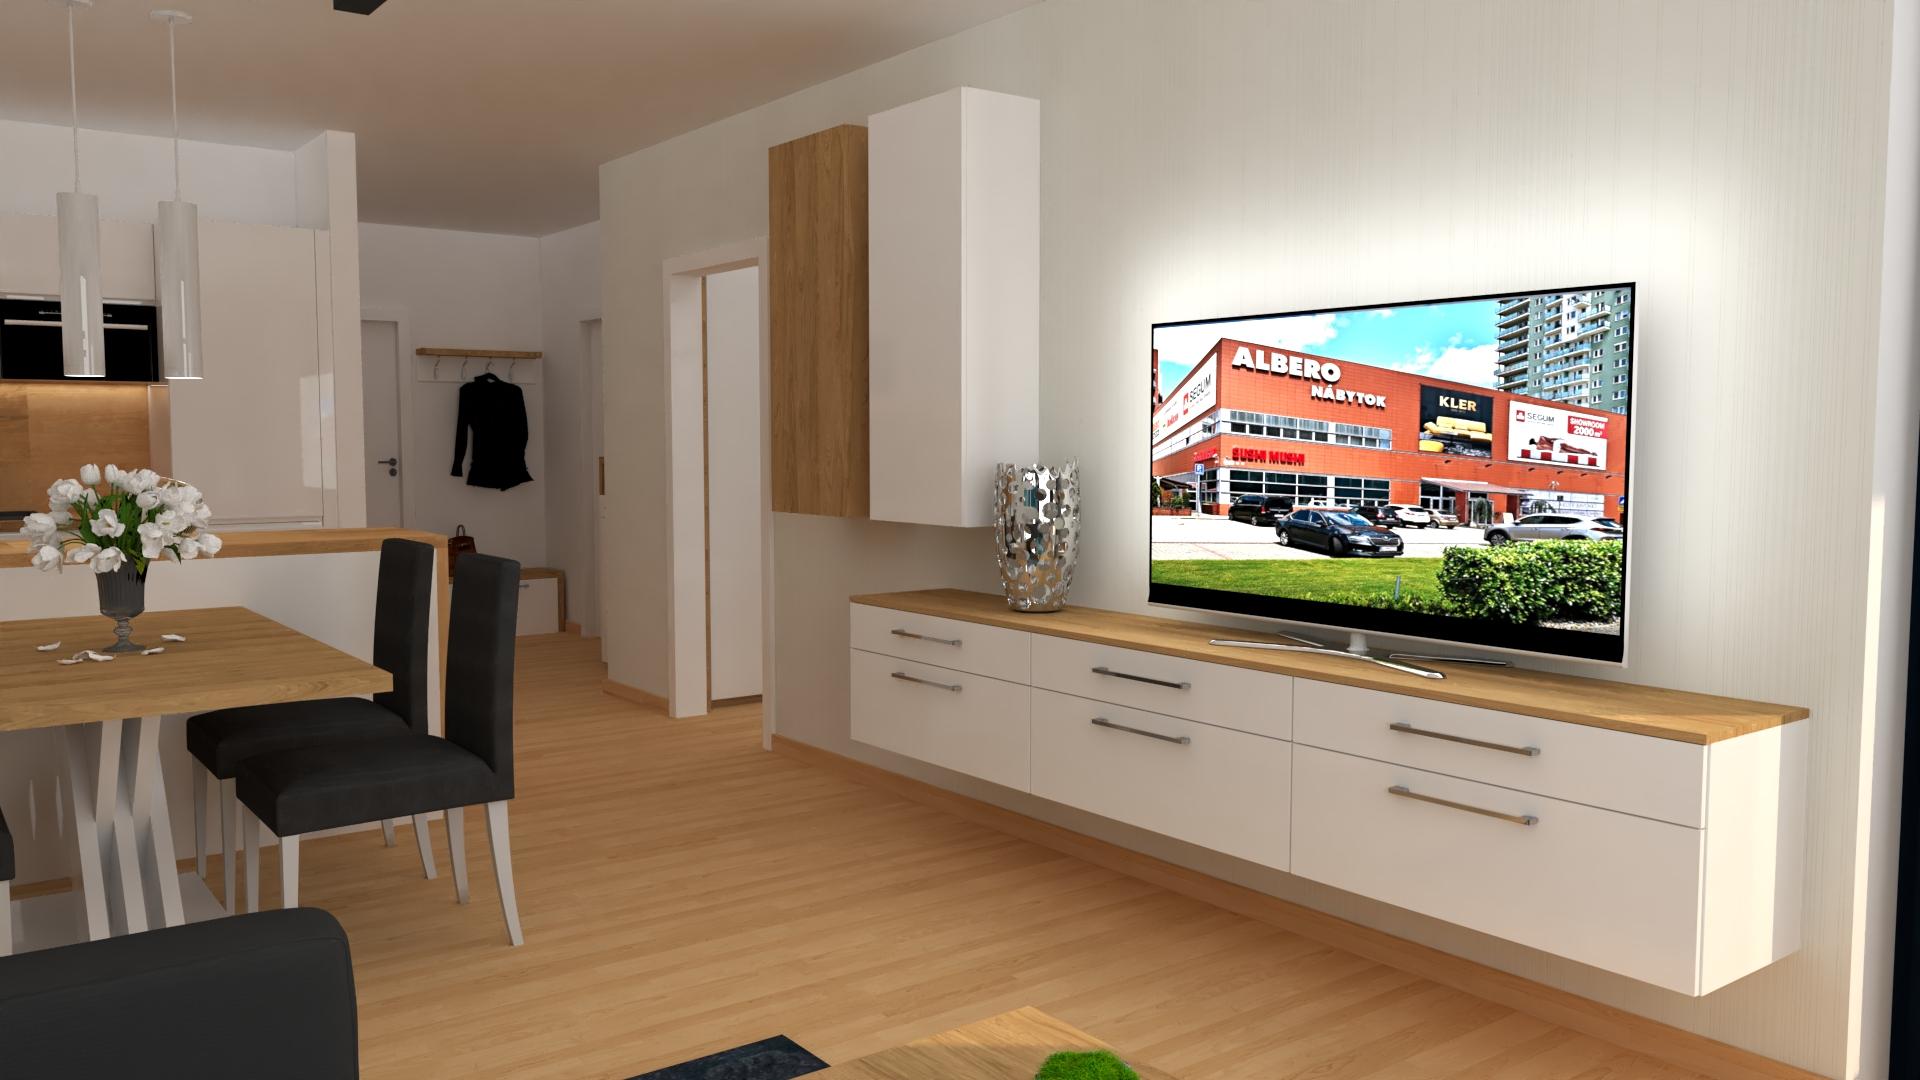 3D vizualizácia obývačky s kuchyňou, chodbou a spálňou